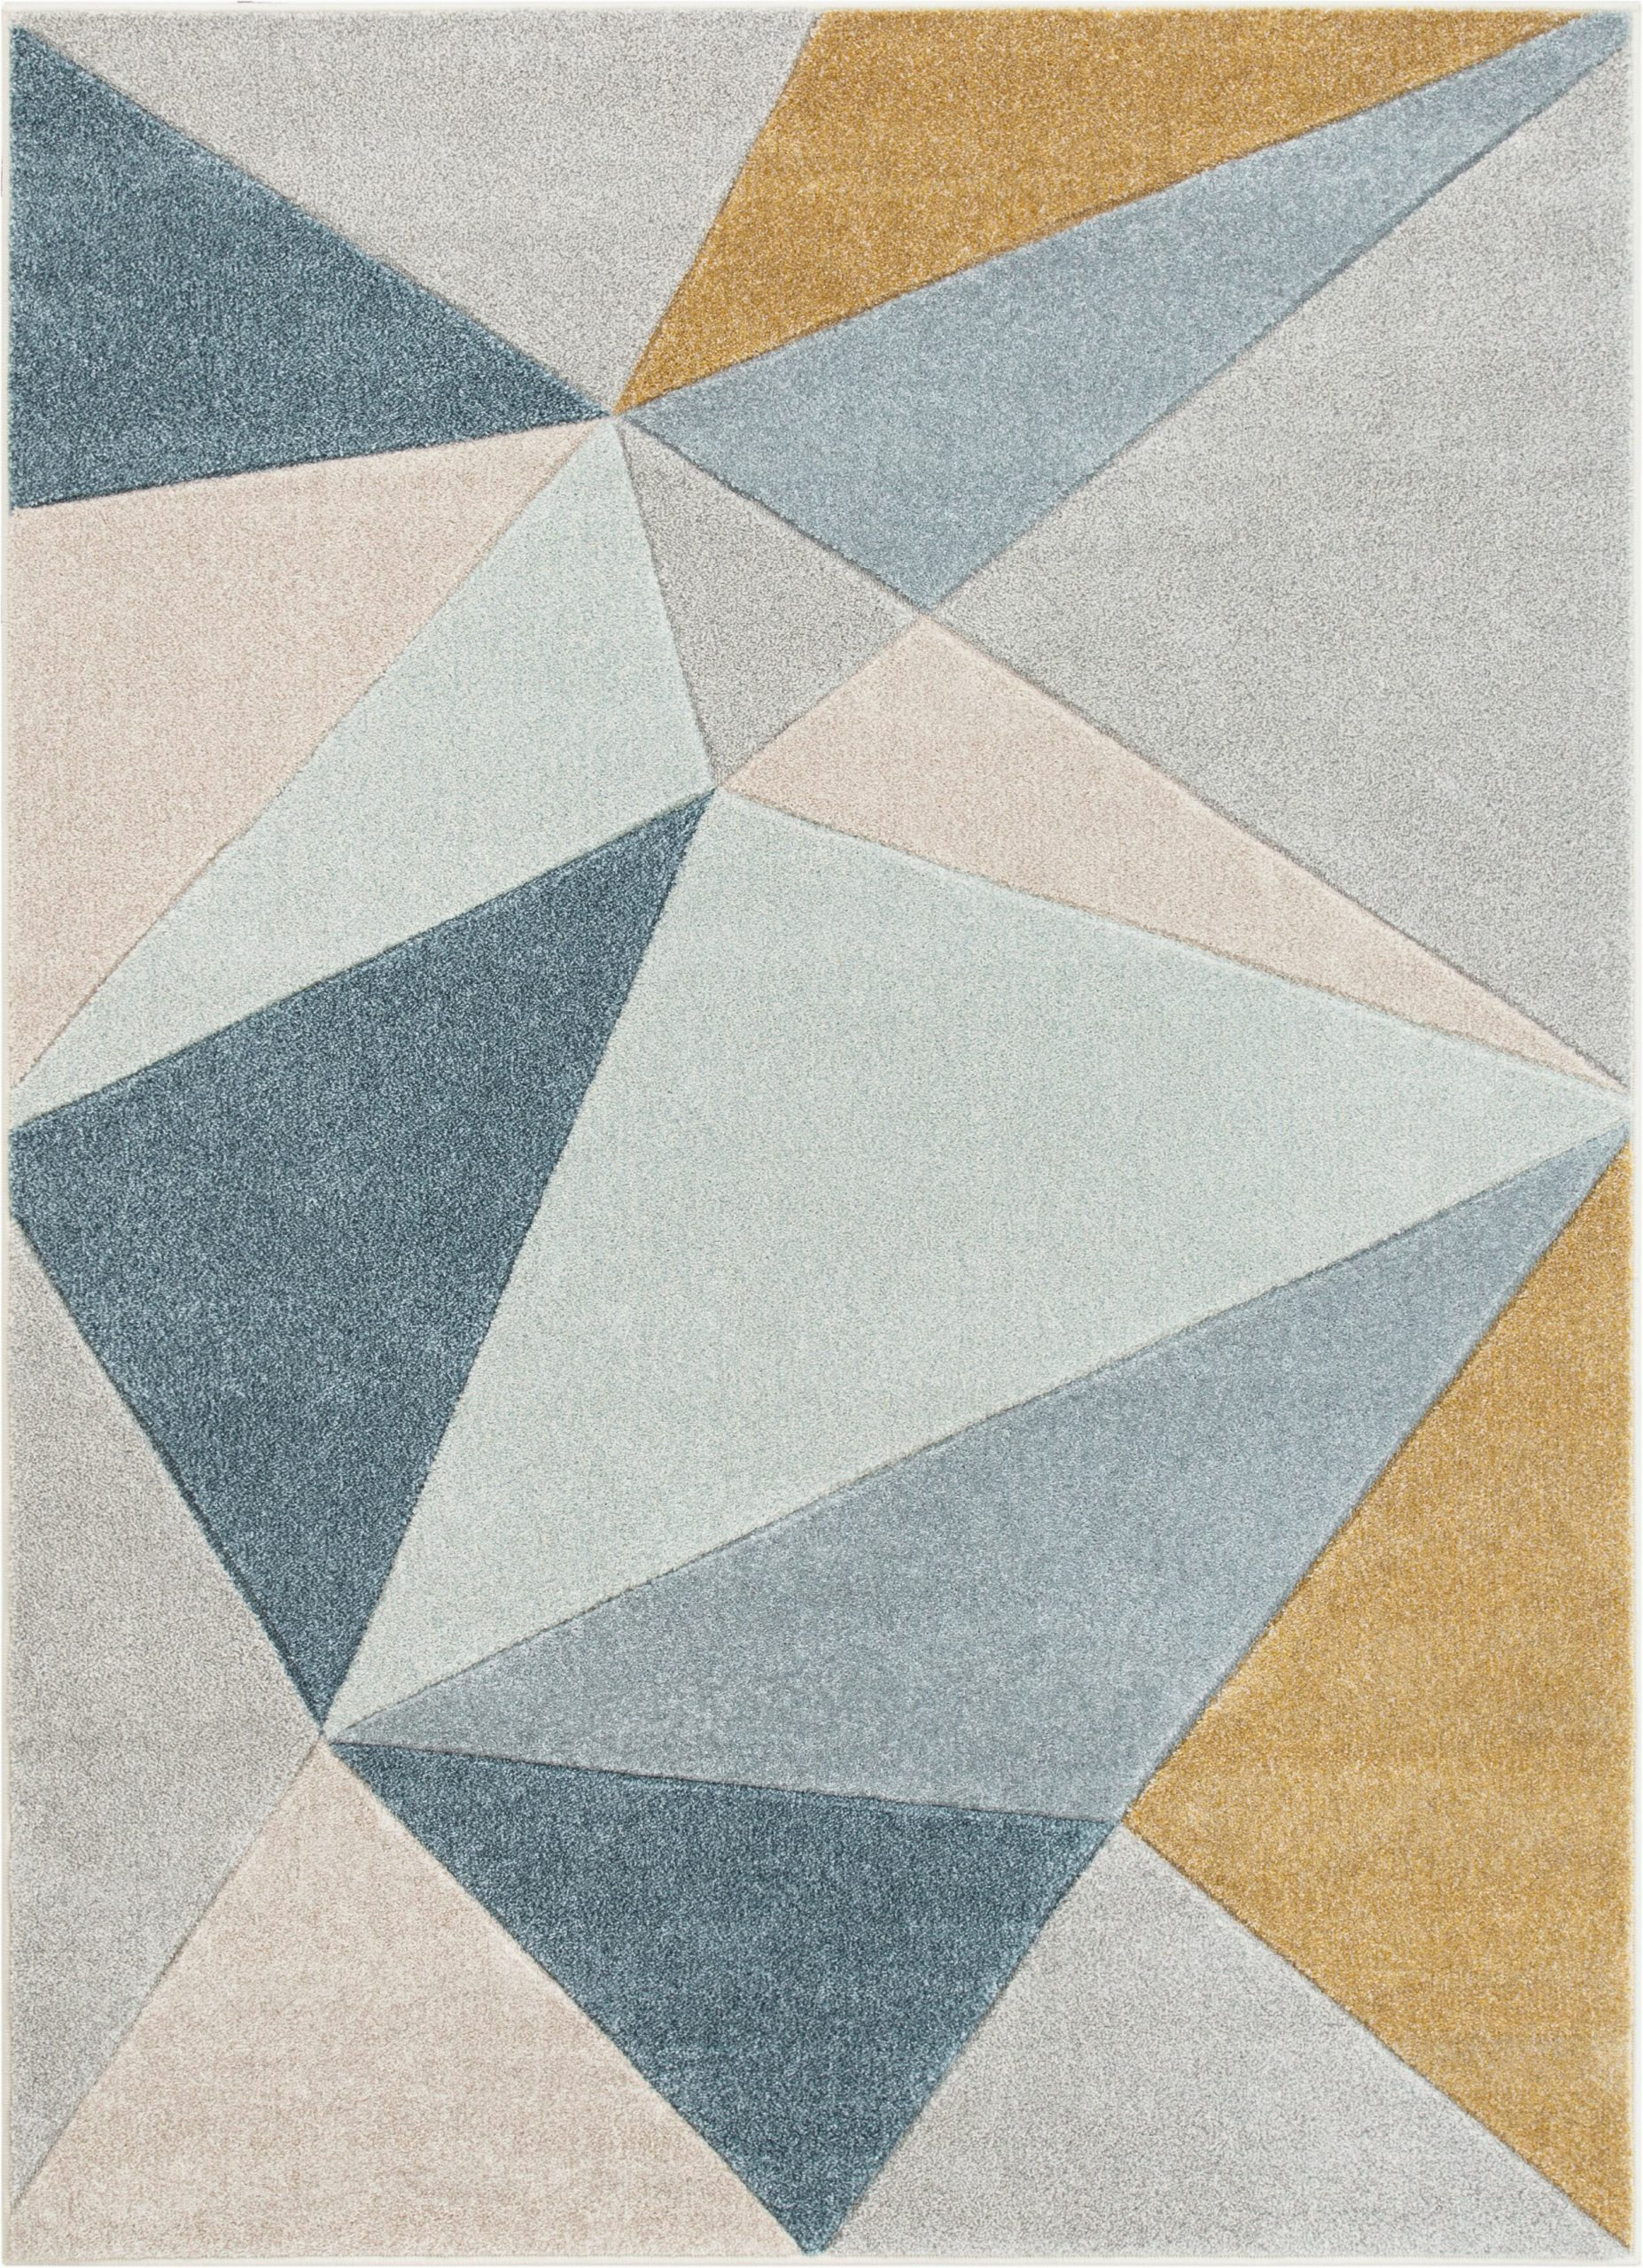 ruby tamara mid century modern abstract geometric teal bluegraygold area rug